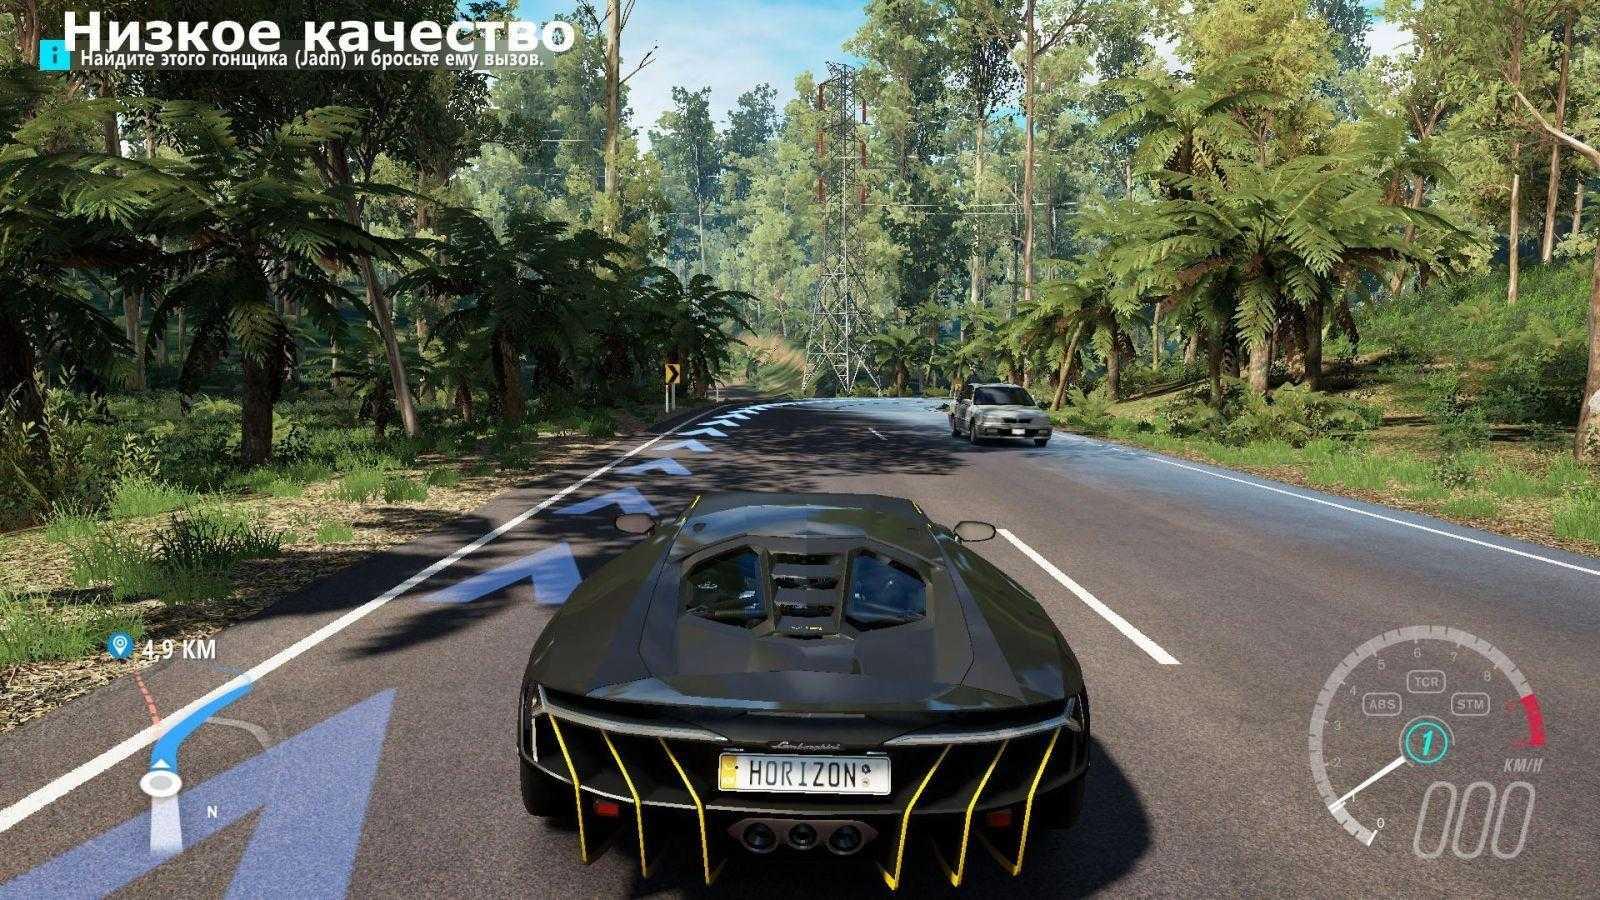 4 - Forza Horizon 3: тестирование производительности